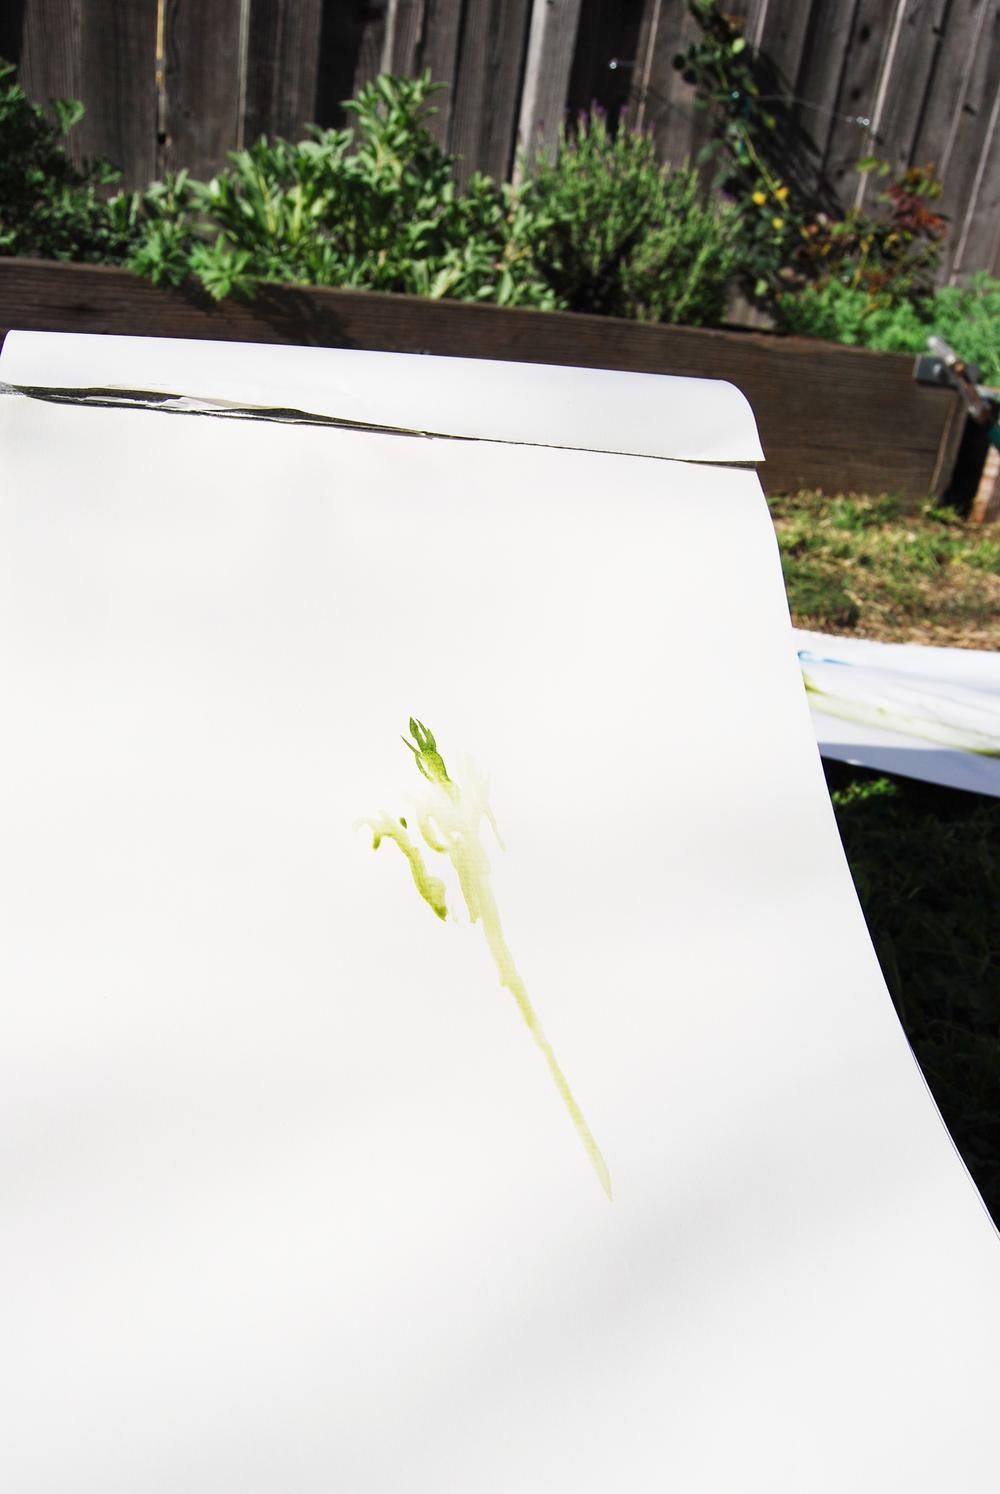 garden_painting_11.jpg